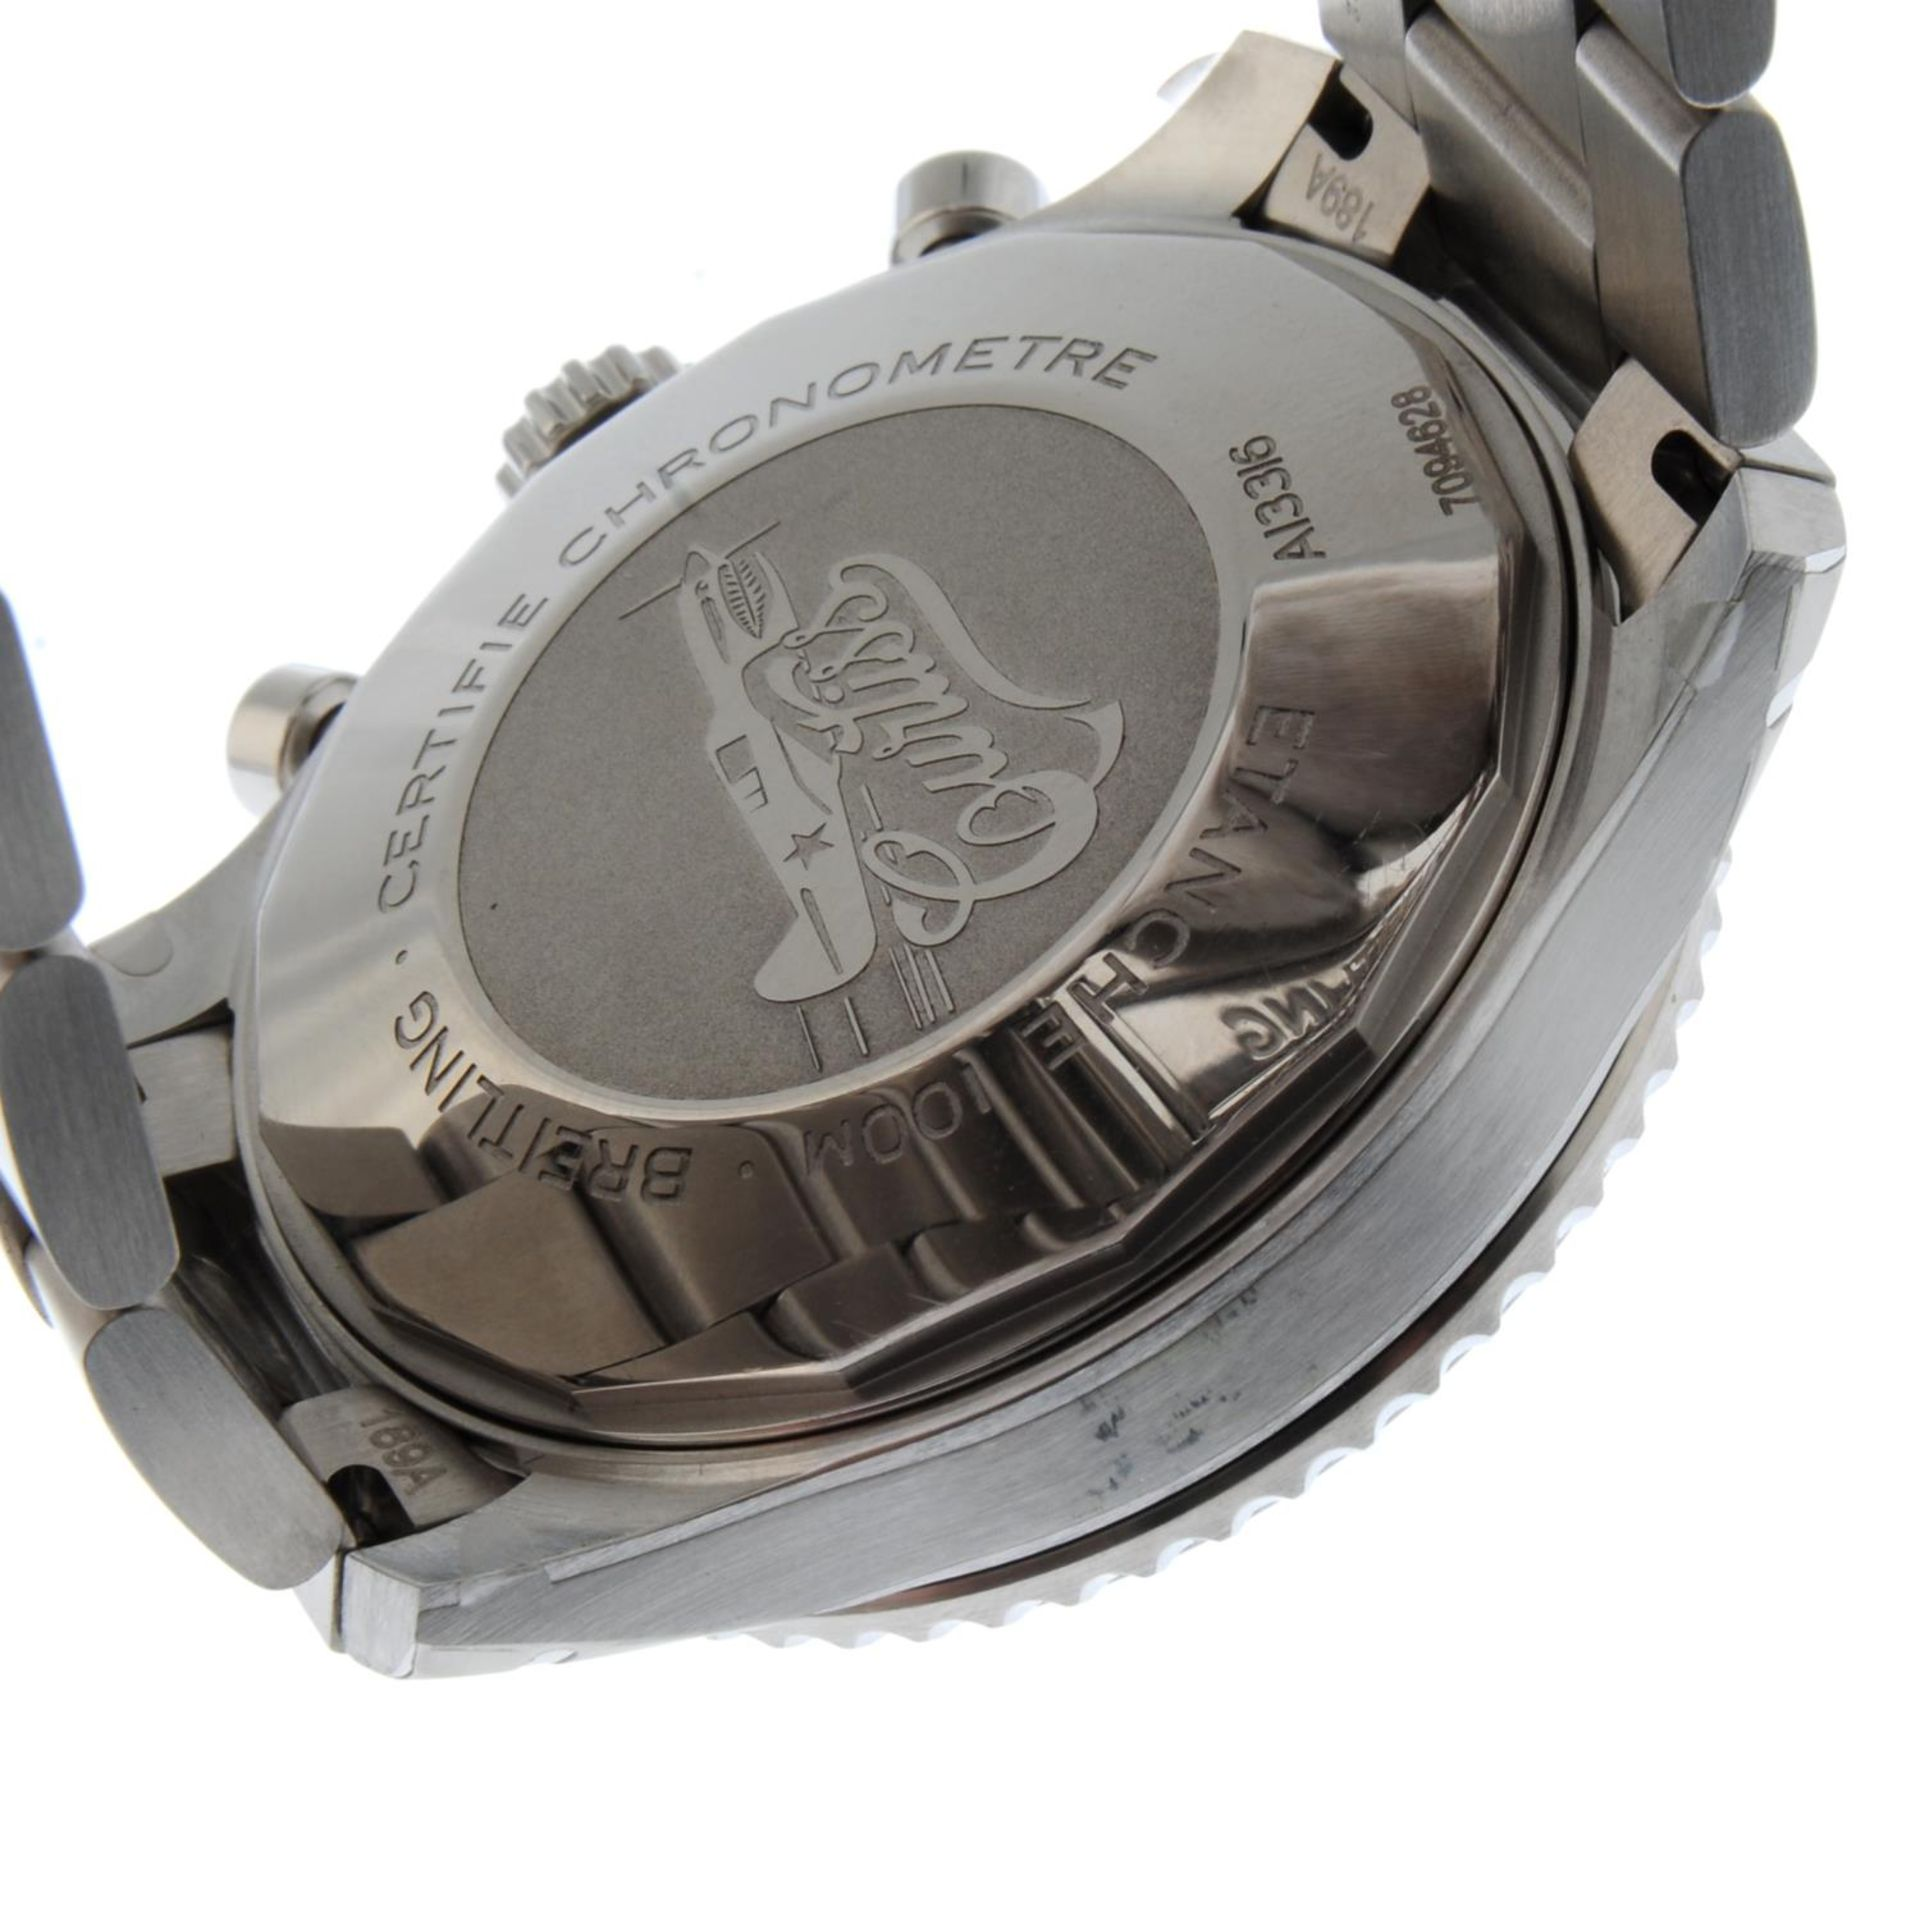 CURRENT MODEL: BREITLING - an Aviator 8 chronograph bracelet watch. - Bild 2 aus 6